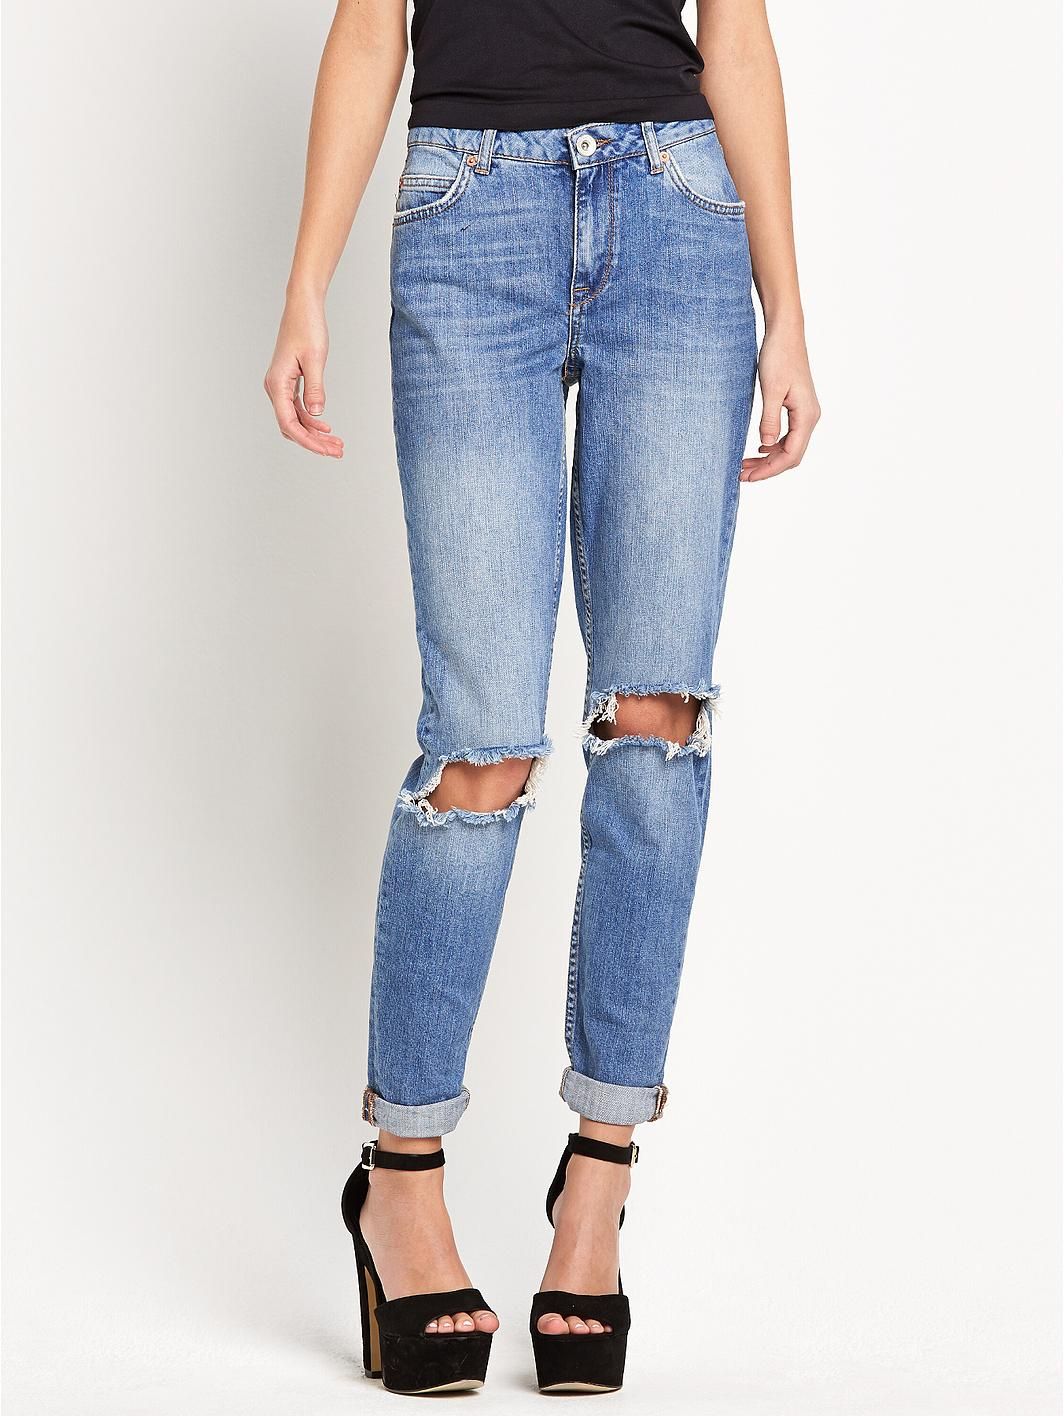 River Island Ashley Boyfriend Jeans